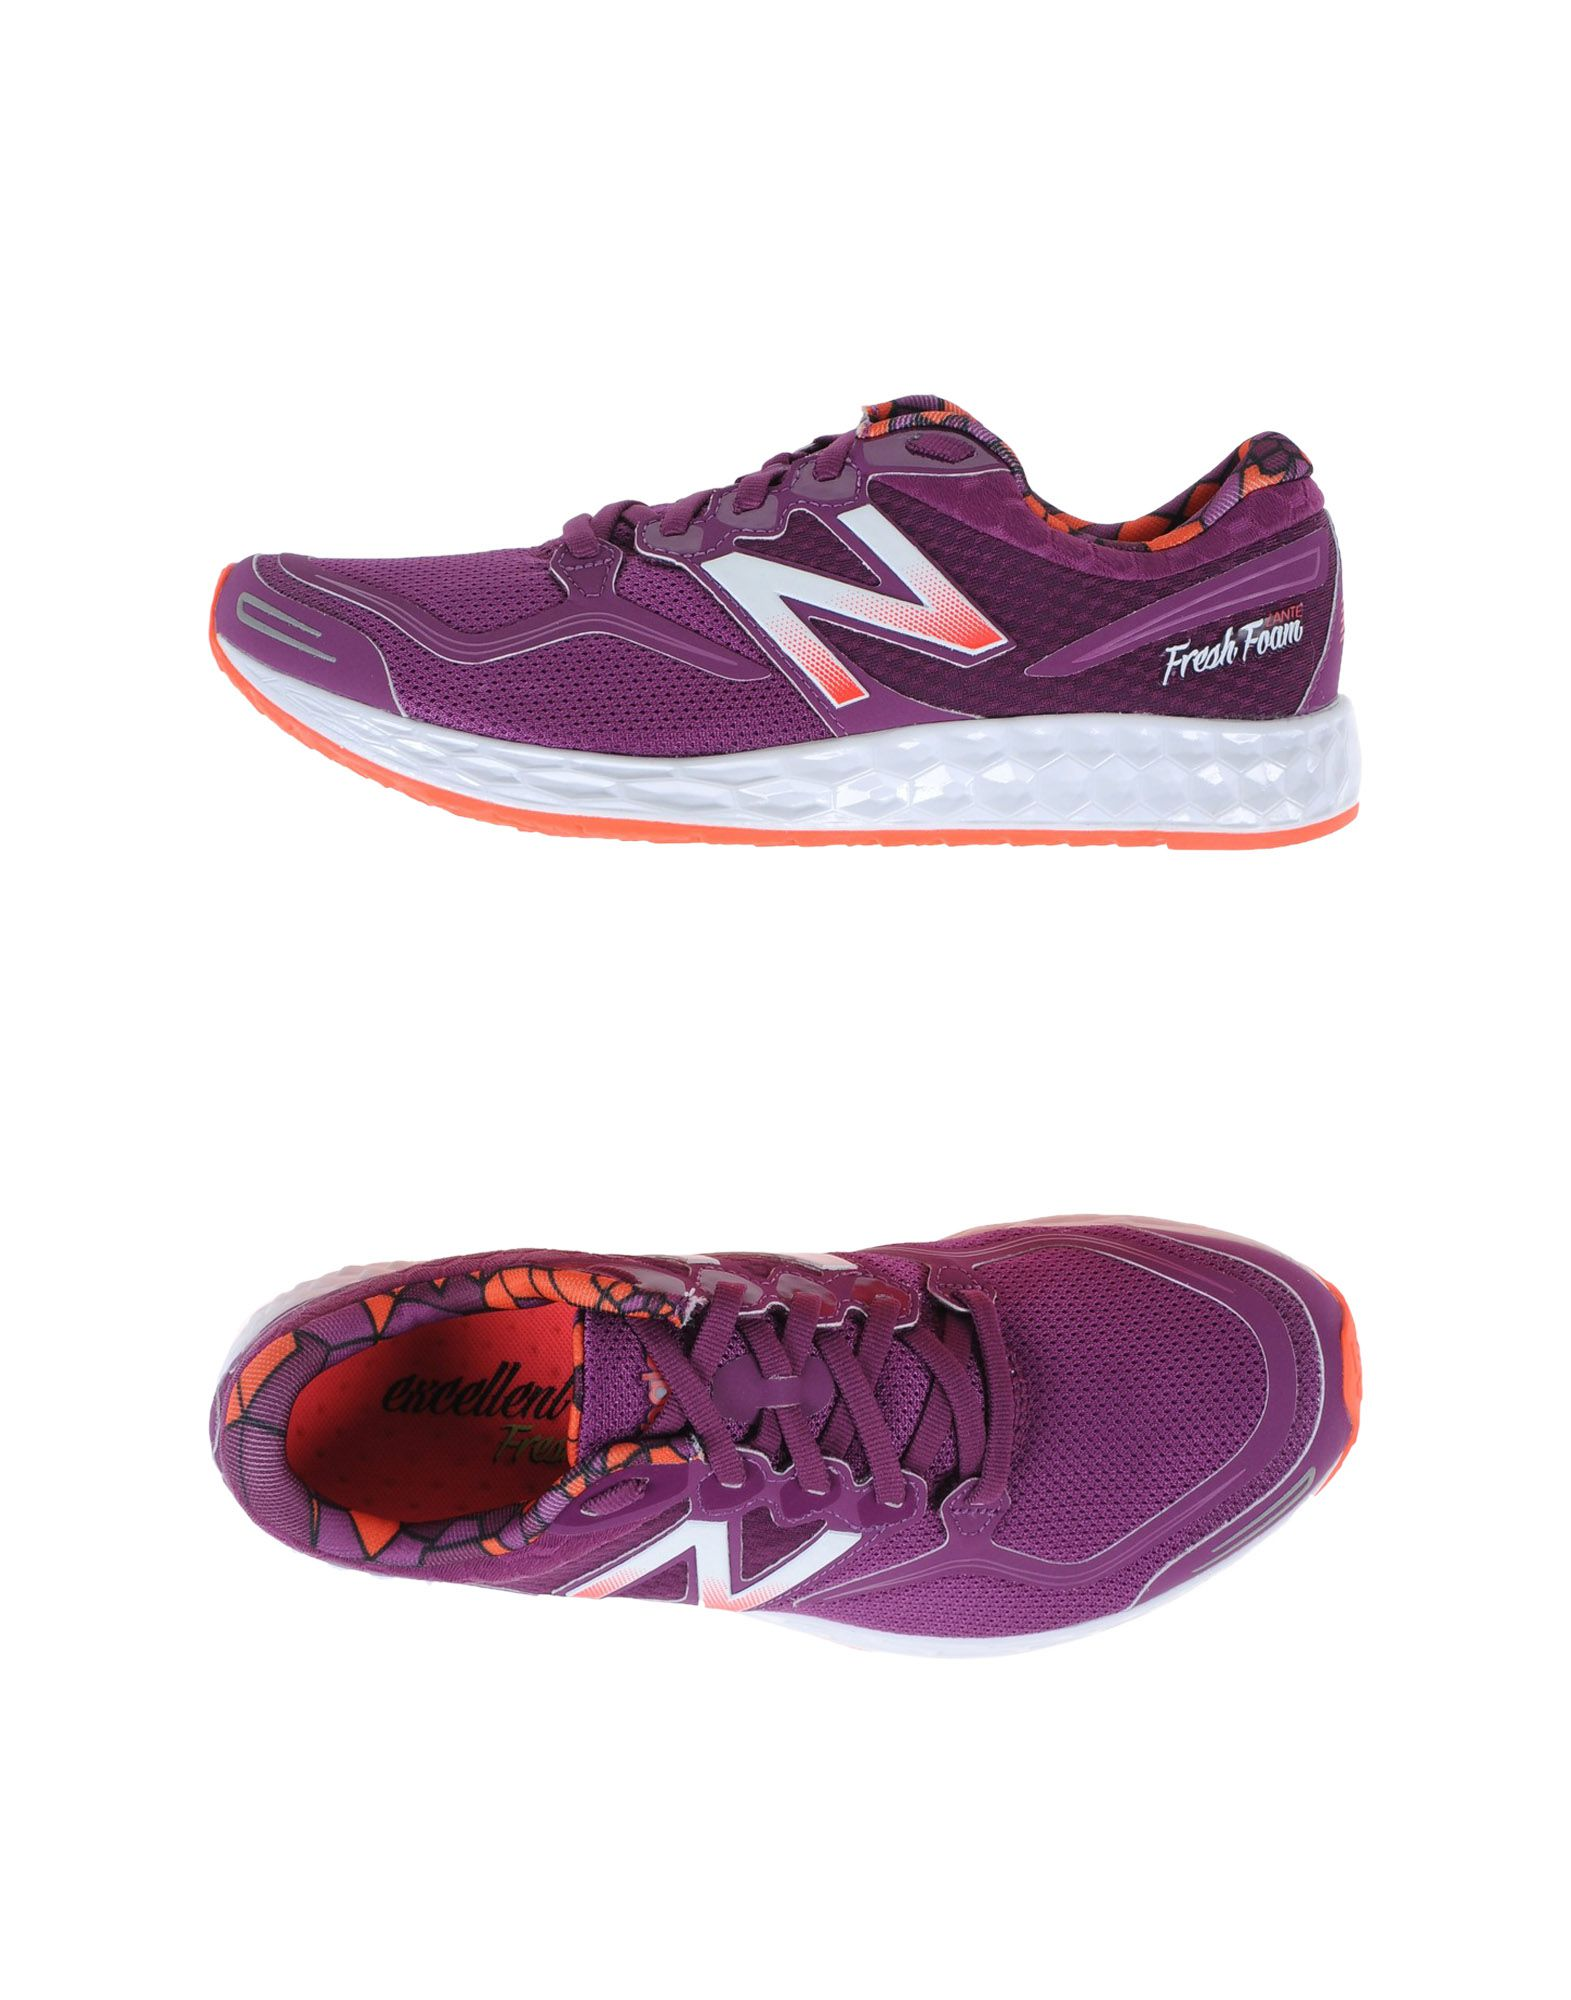 Sneakers New Balance Fresh Foam Zante - Femme - Sneakers New Balance sur